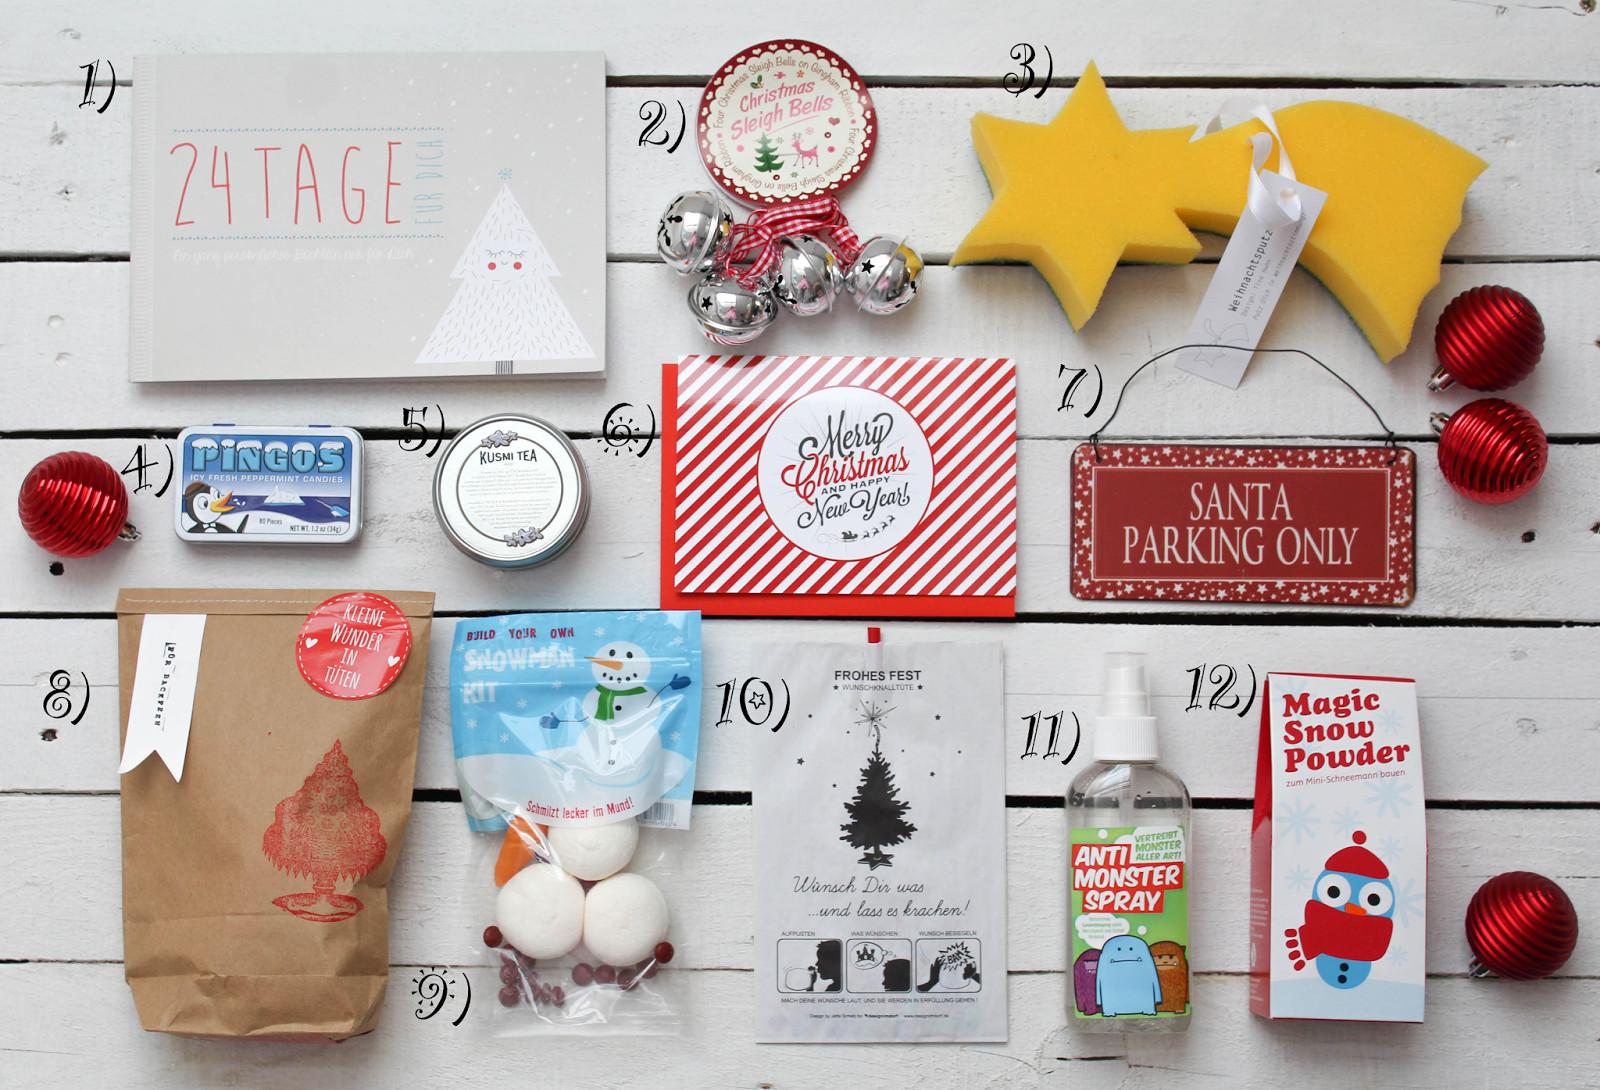 Diy Adventskalender Beste Freundin  DIY Adventskalender Ideen Nr 2 Für beste Freundin